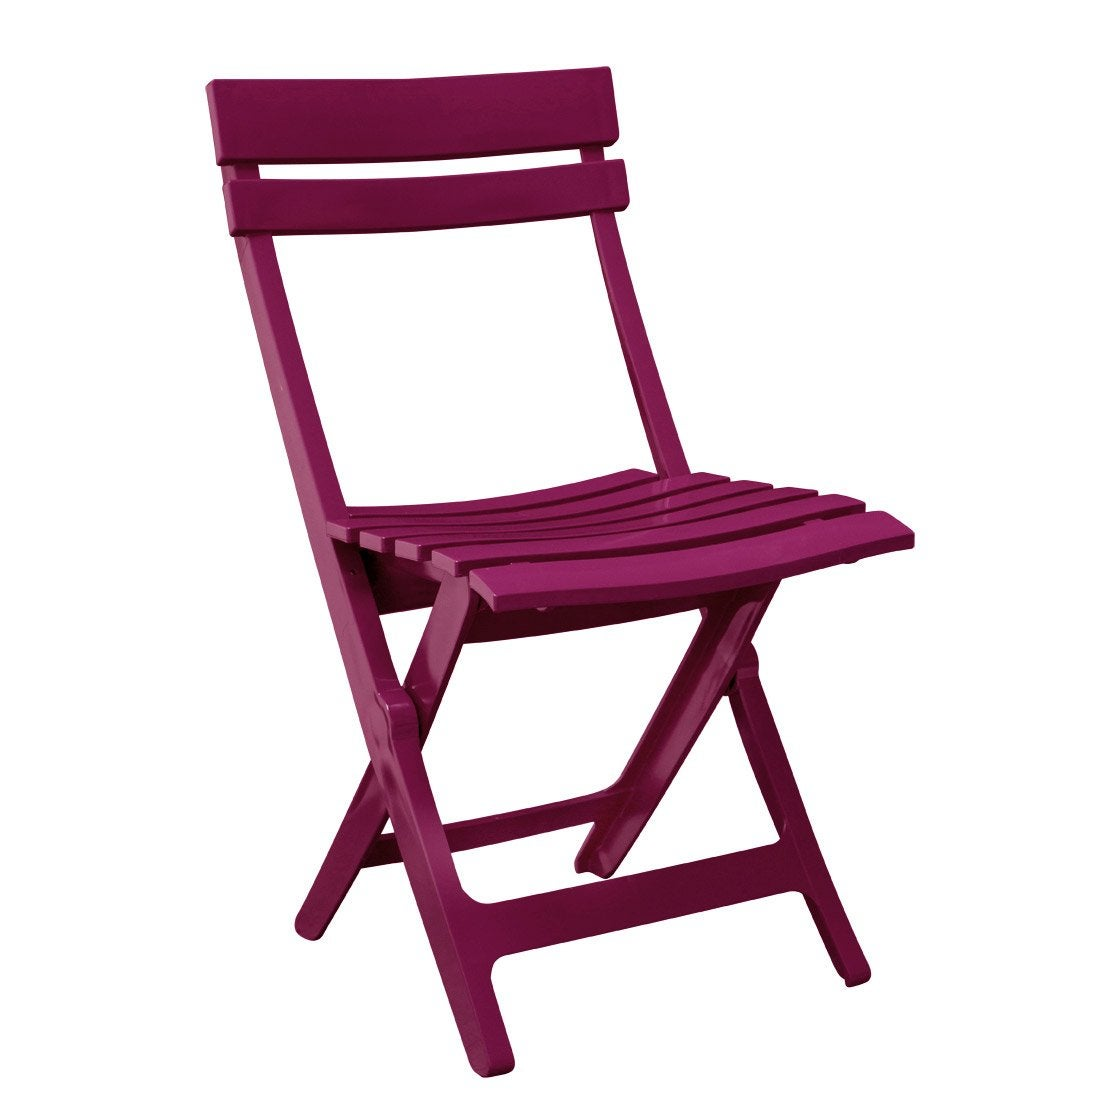 Chaise de jardin en résine injectée Miami framboise | Leroy Merlin